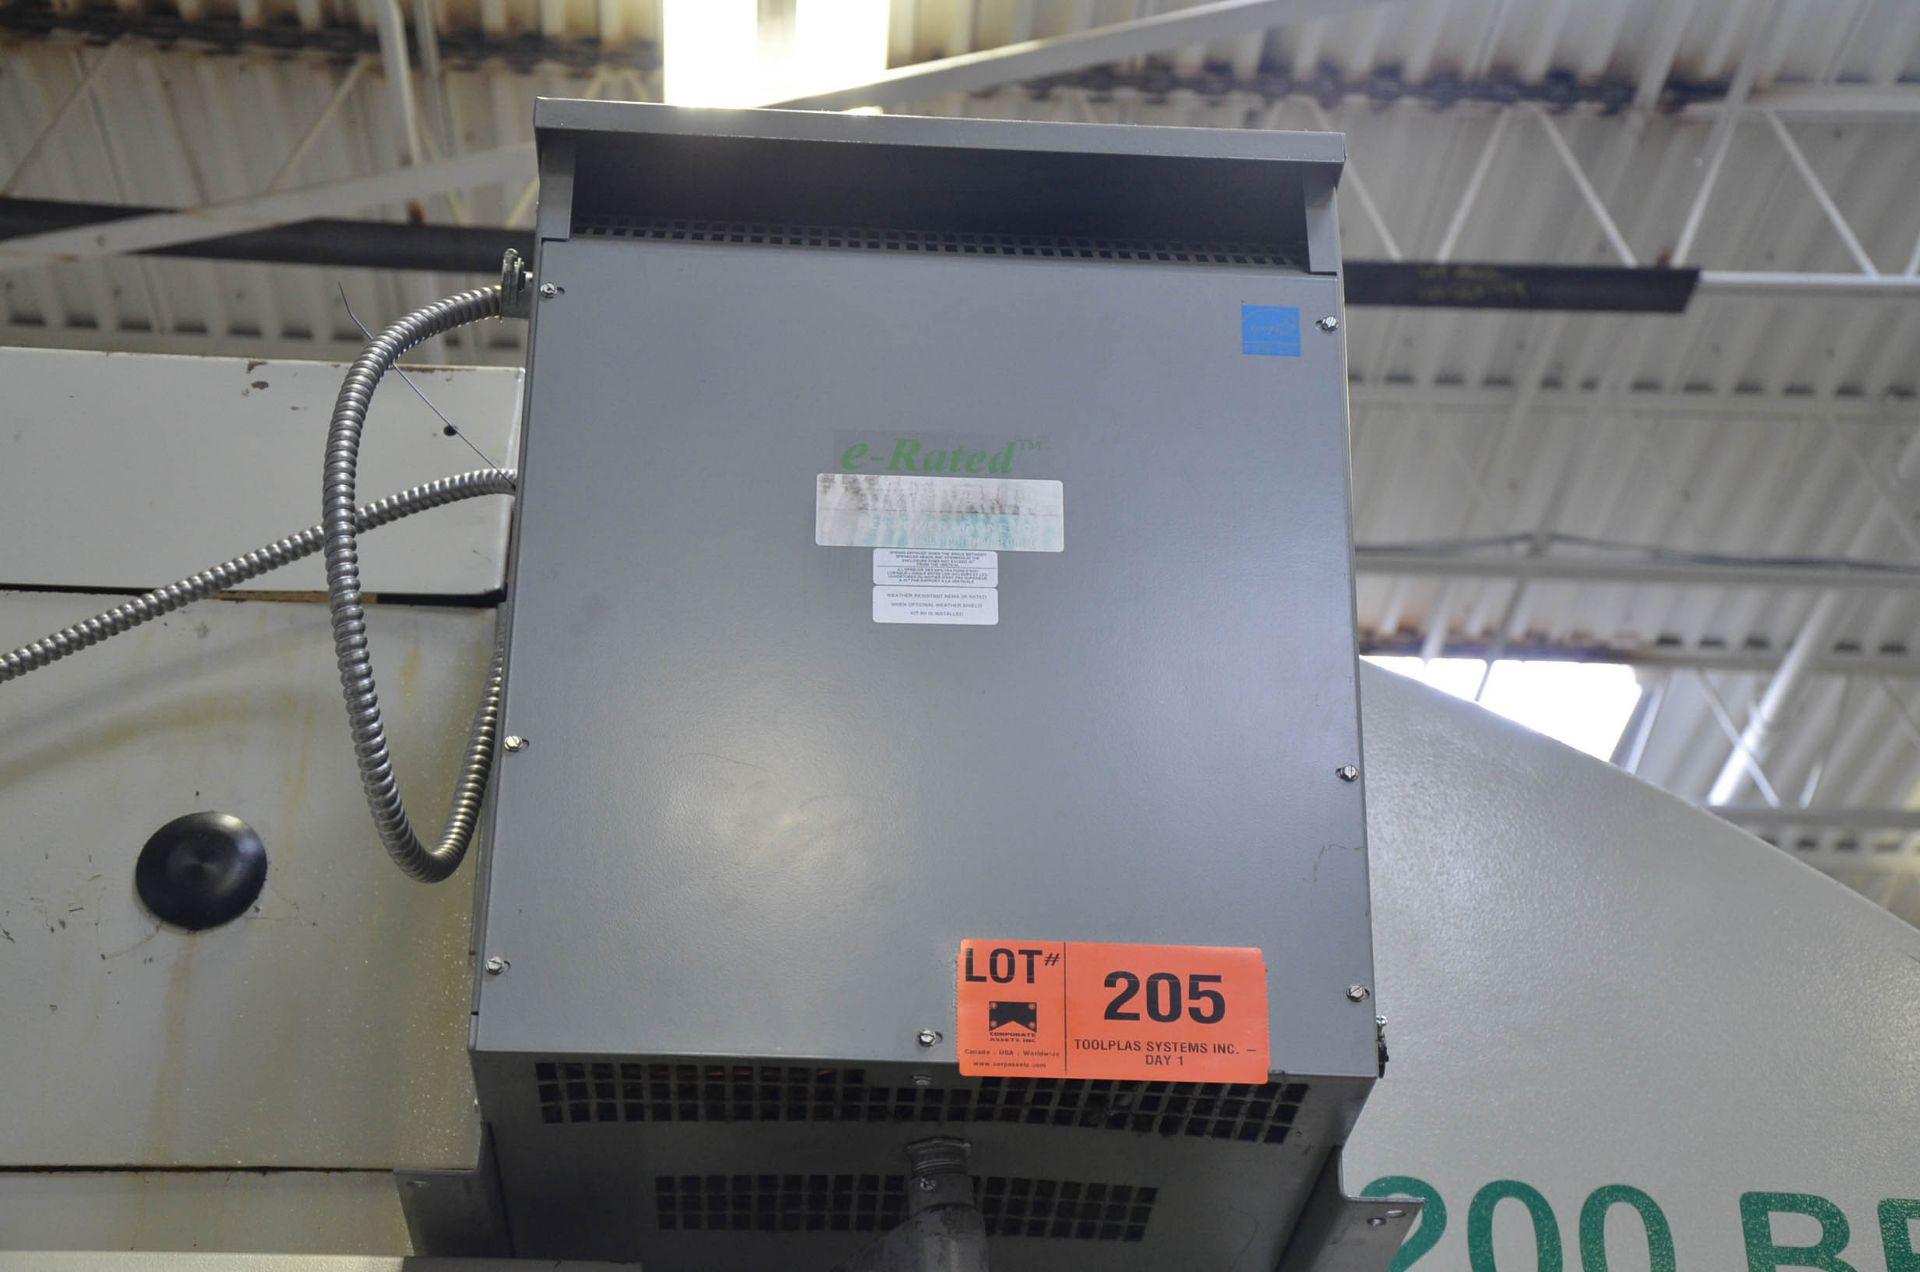 REX 45KVA/600-380-220V/3PH/60HZ TRANSFORMER (CI) [RIGGING FEES FOR LOT #205 - $50 USD PLUS